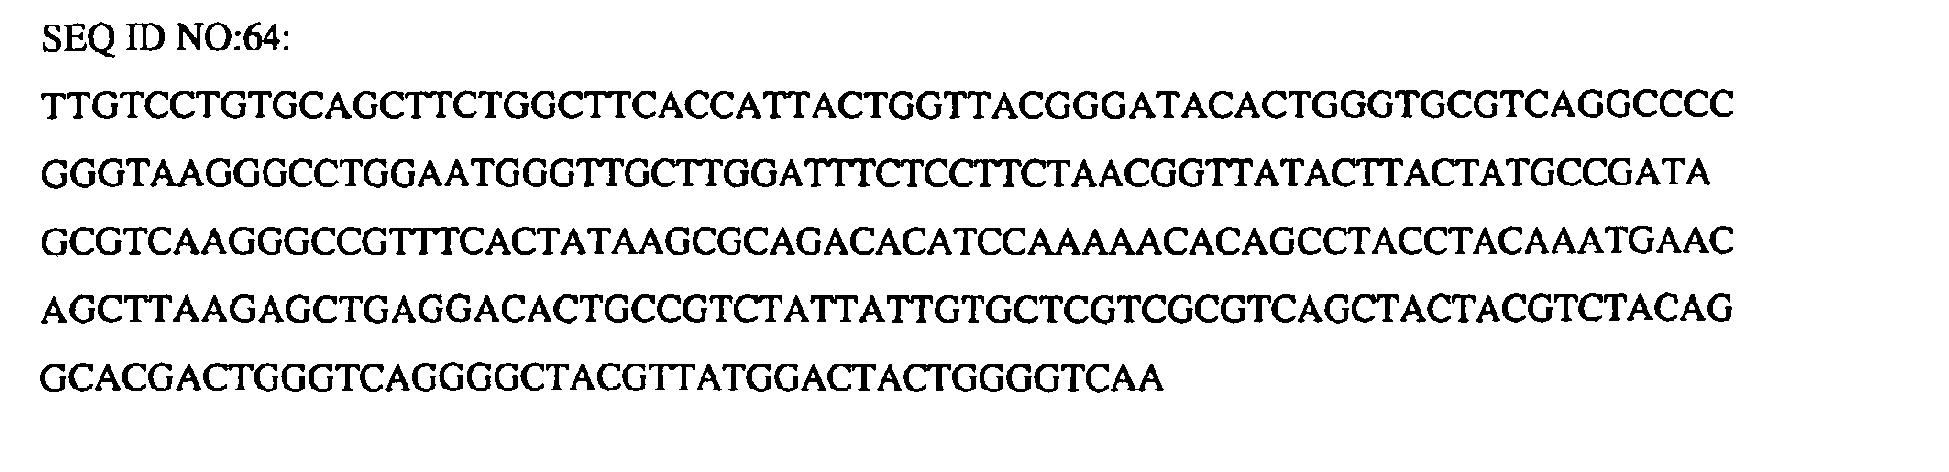 Figure imgb0039